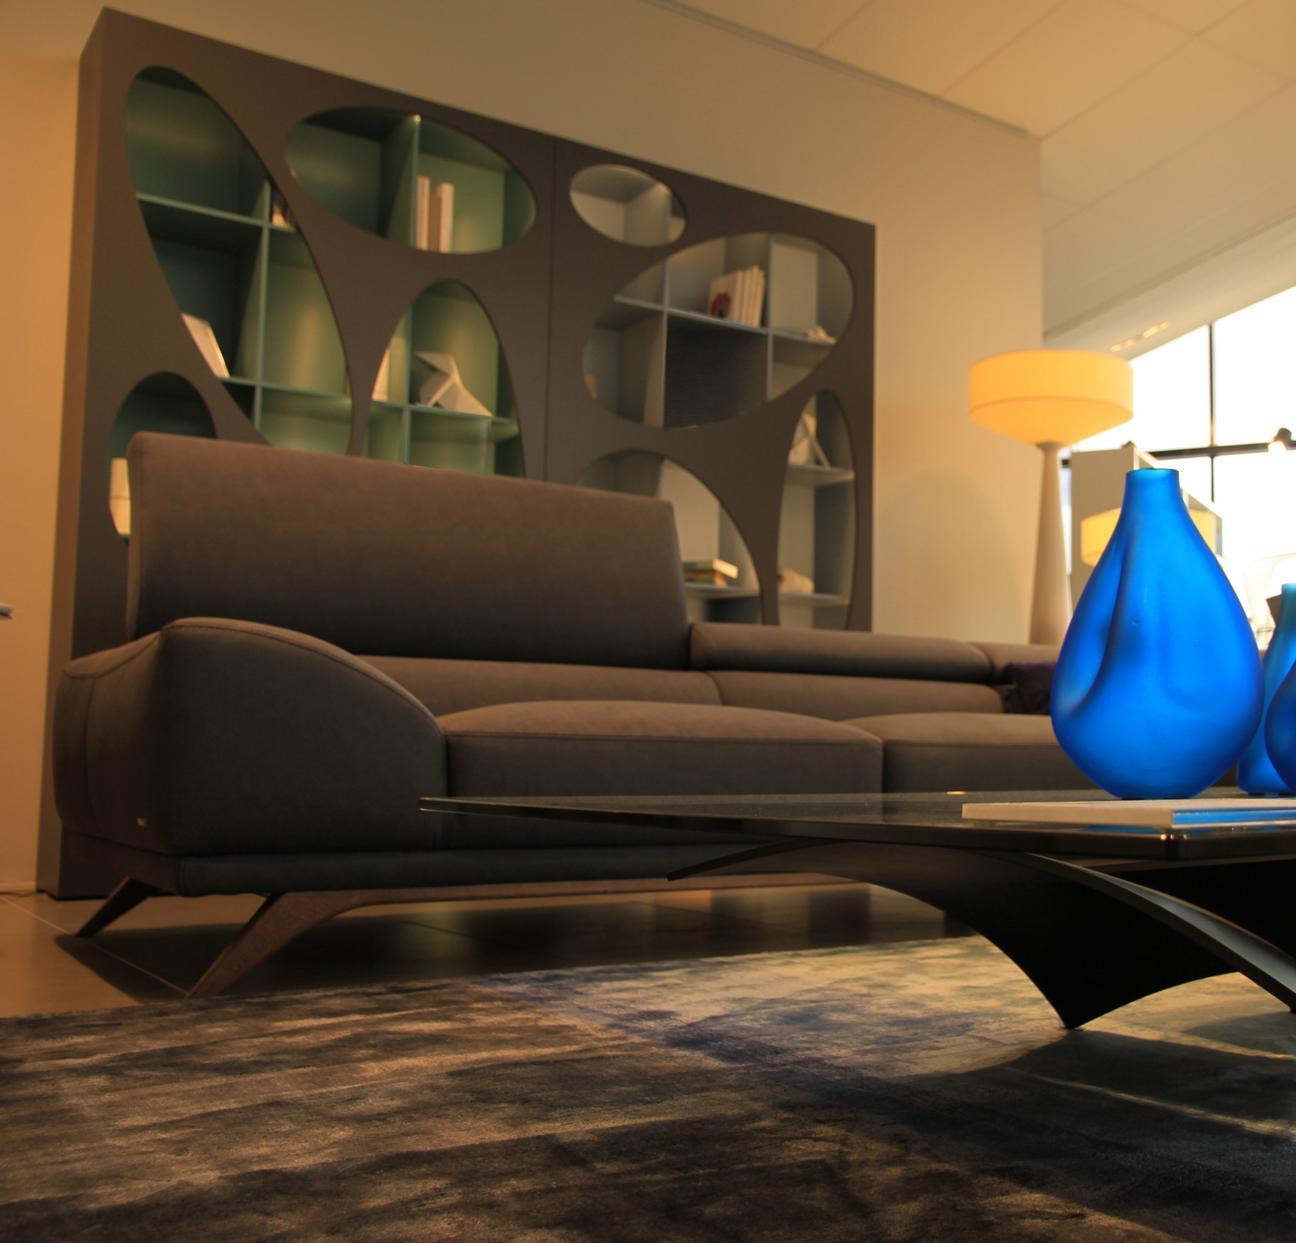 roche bobois showroom dijon quetigny 21800. Black Bedroom Furniture Sets. Home Design Ideas